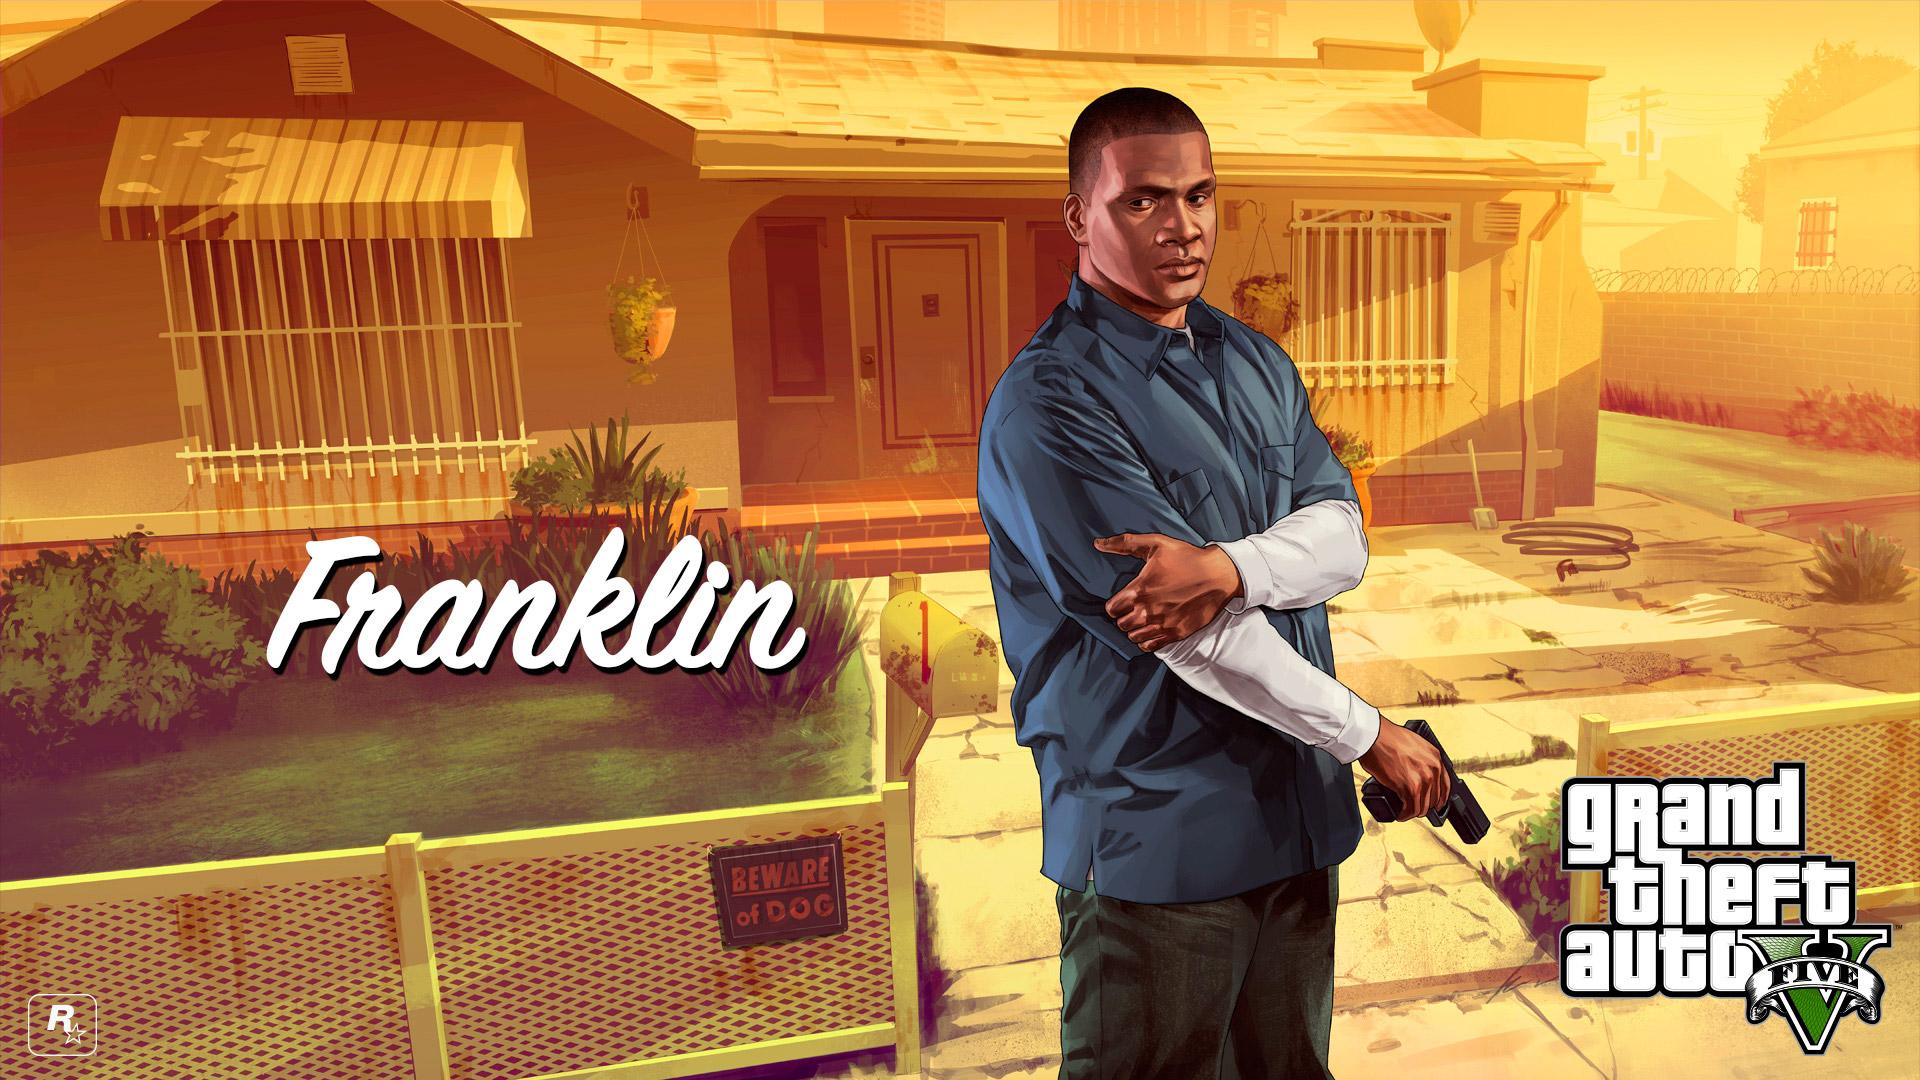 Grand Theft Auto 5 wallpaper 30